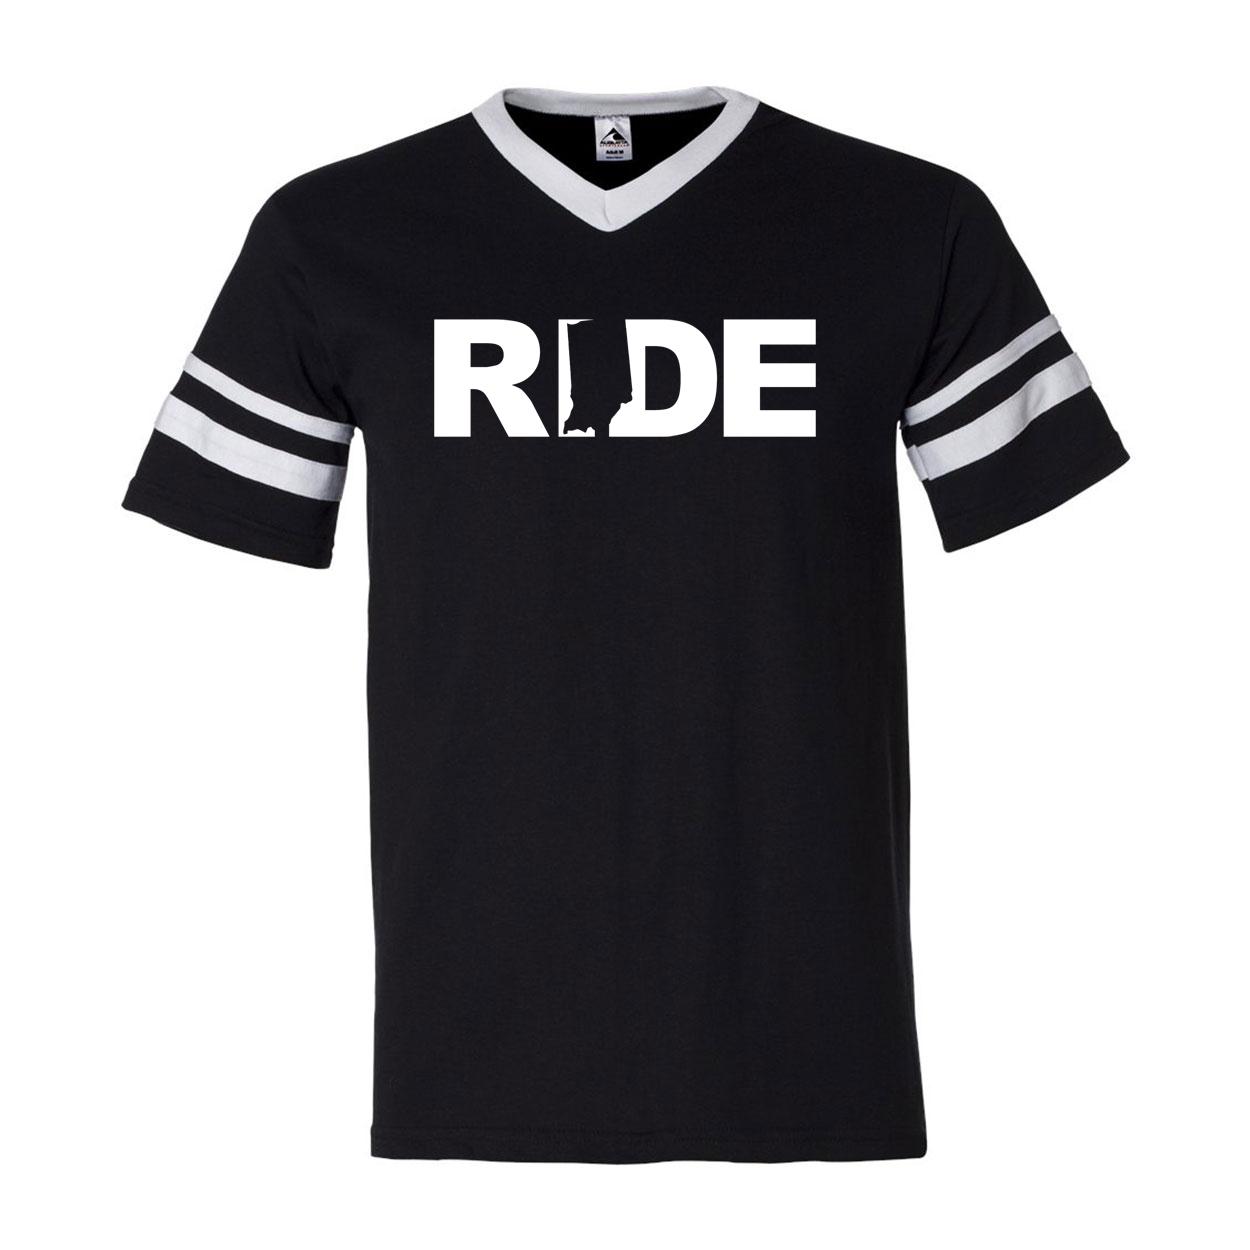 Ride Indiana Classic Premium Striped Jersey T-Shirt Black/White (White Logo)